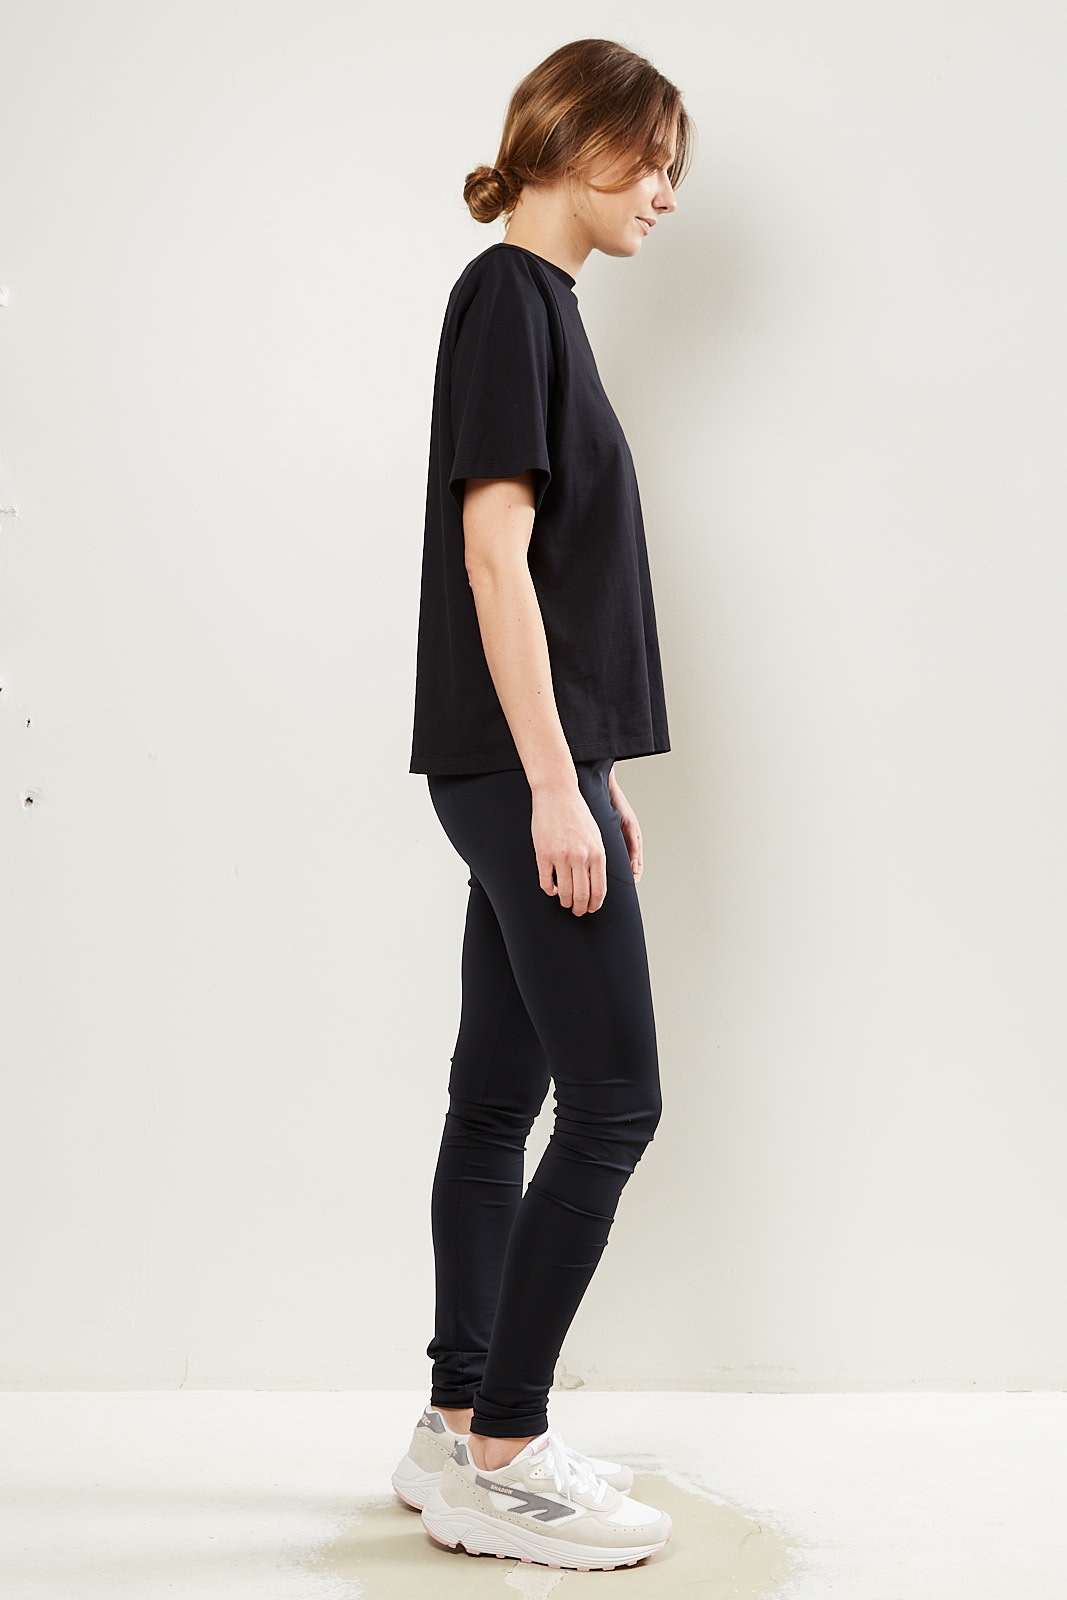 Monique van Heist - legging lycra vintage